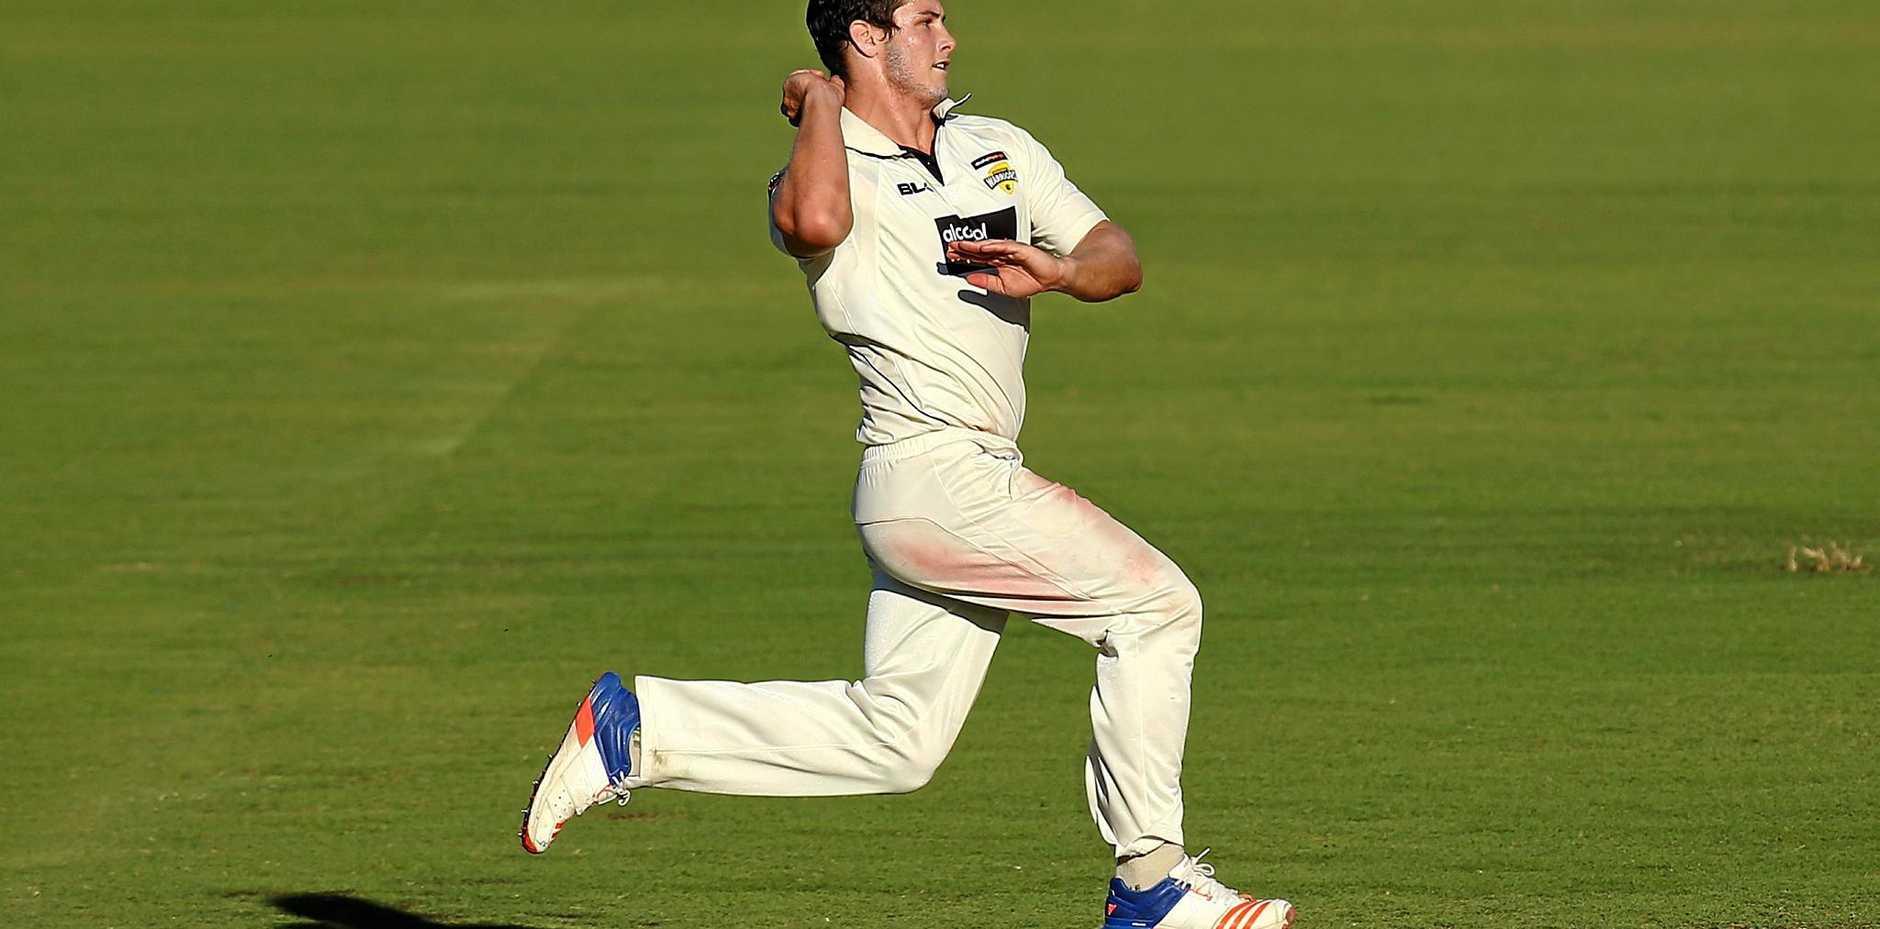 Hilton Cartwright bowls for Western Australia against Tasmania at the WACA in November.